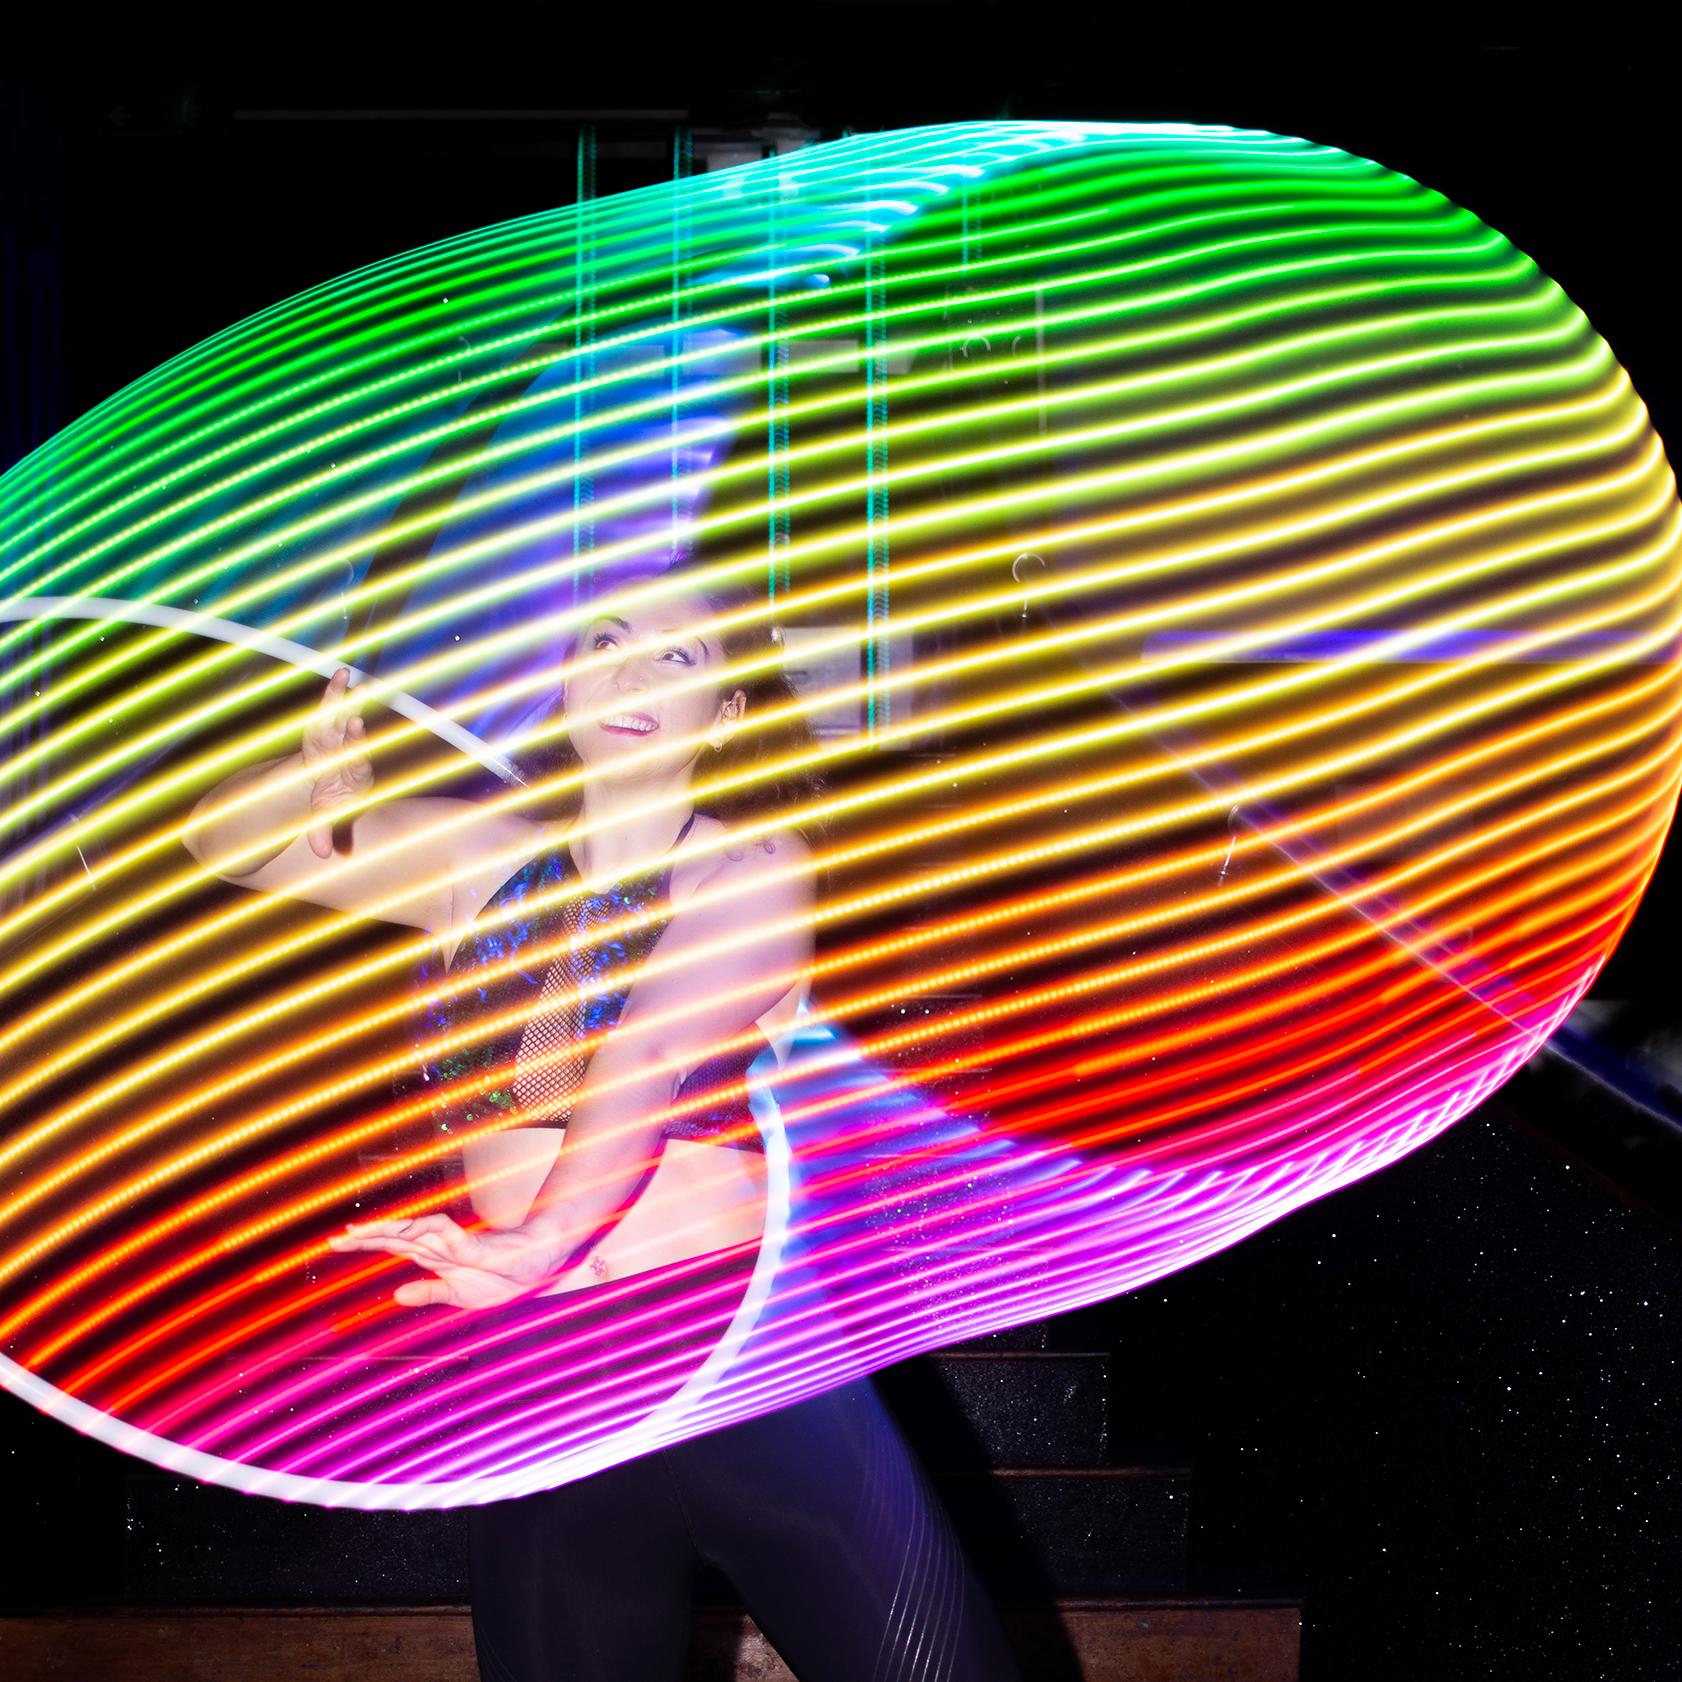 LED HOOP ARTIST